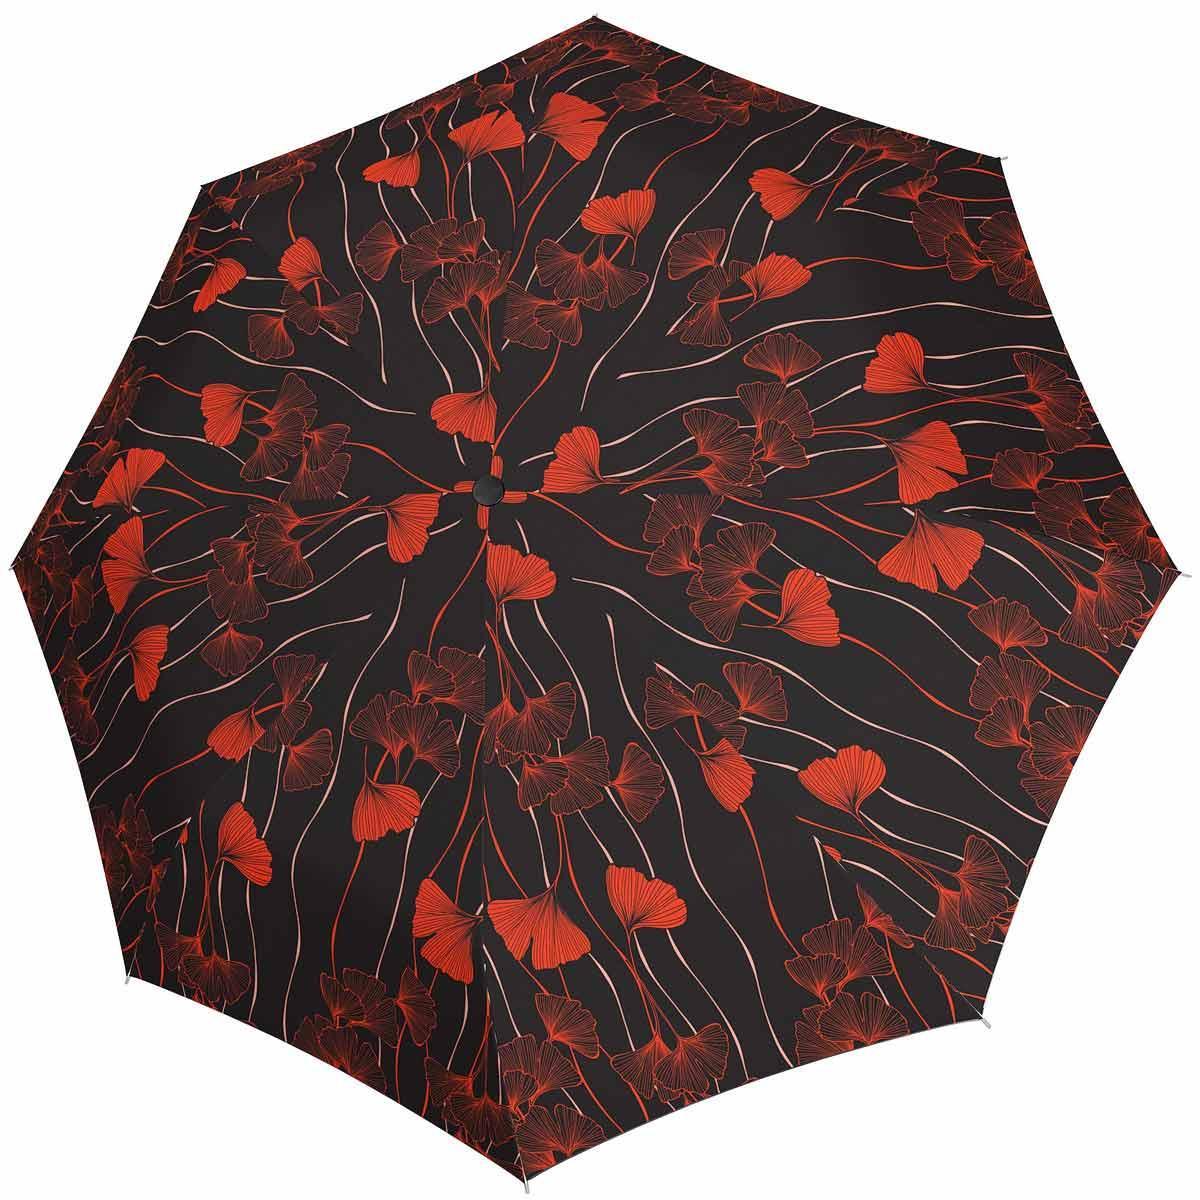 Зонт Doppler 74665GFGR03 сатин, антиветер